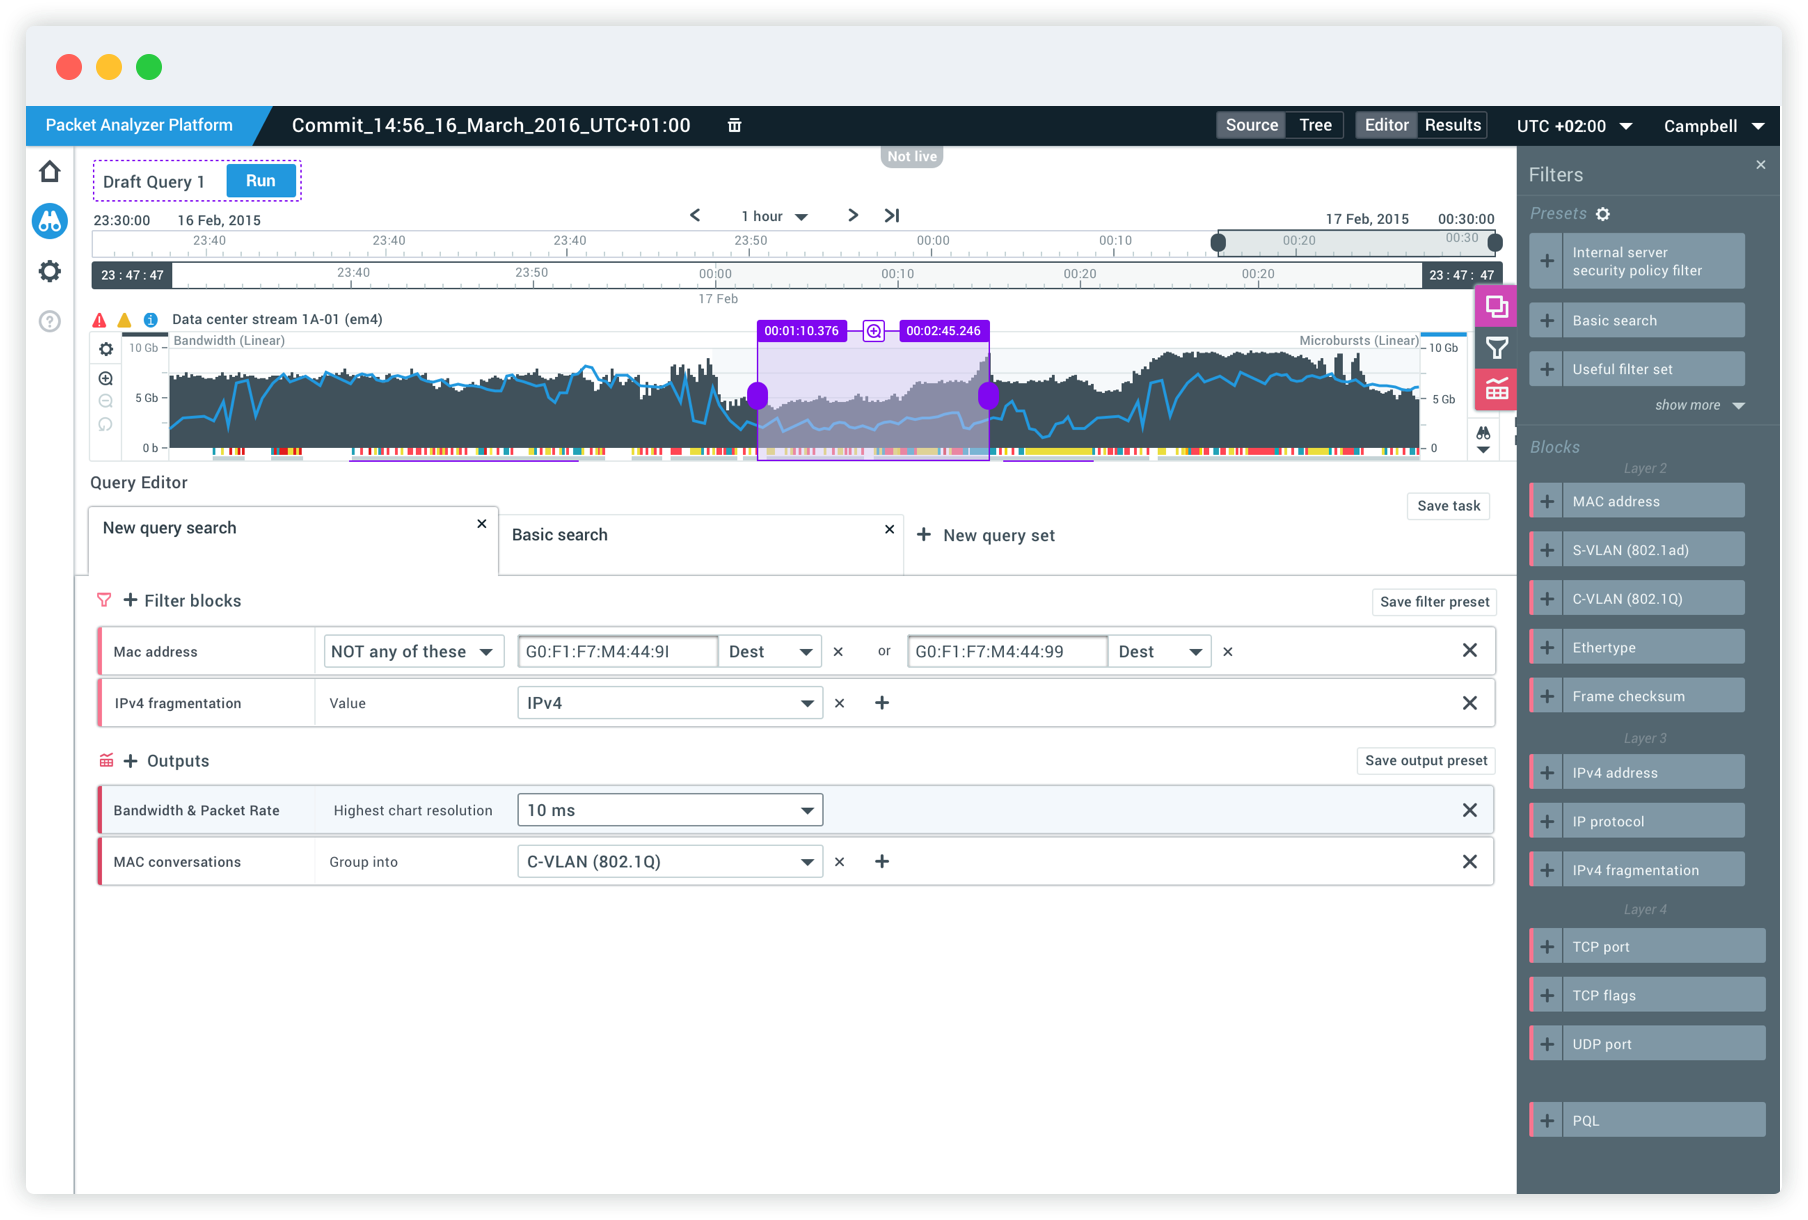 Packet Analyzer Platform mockups